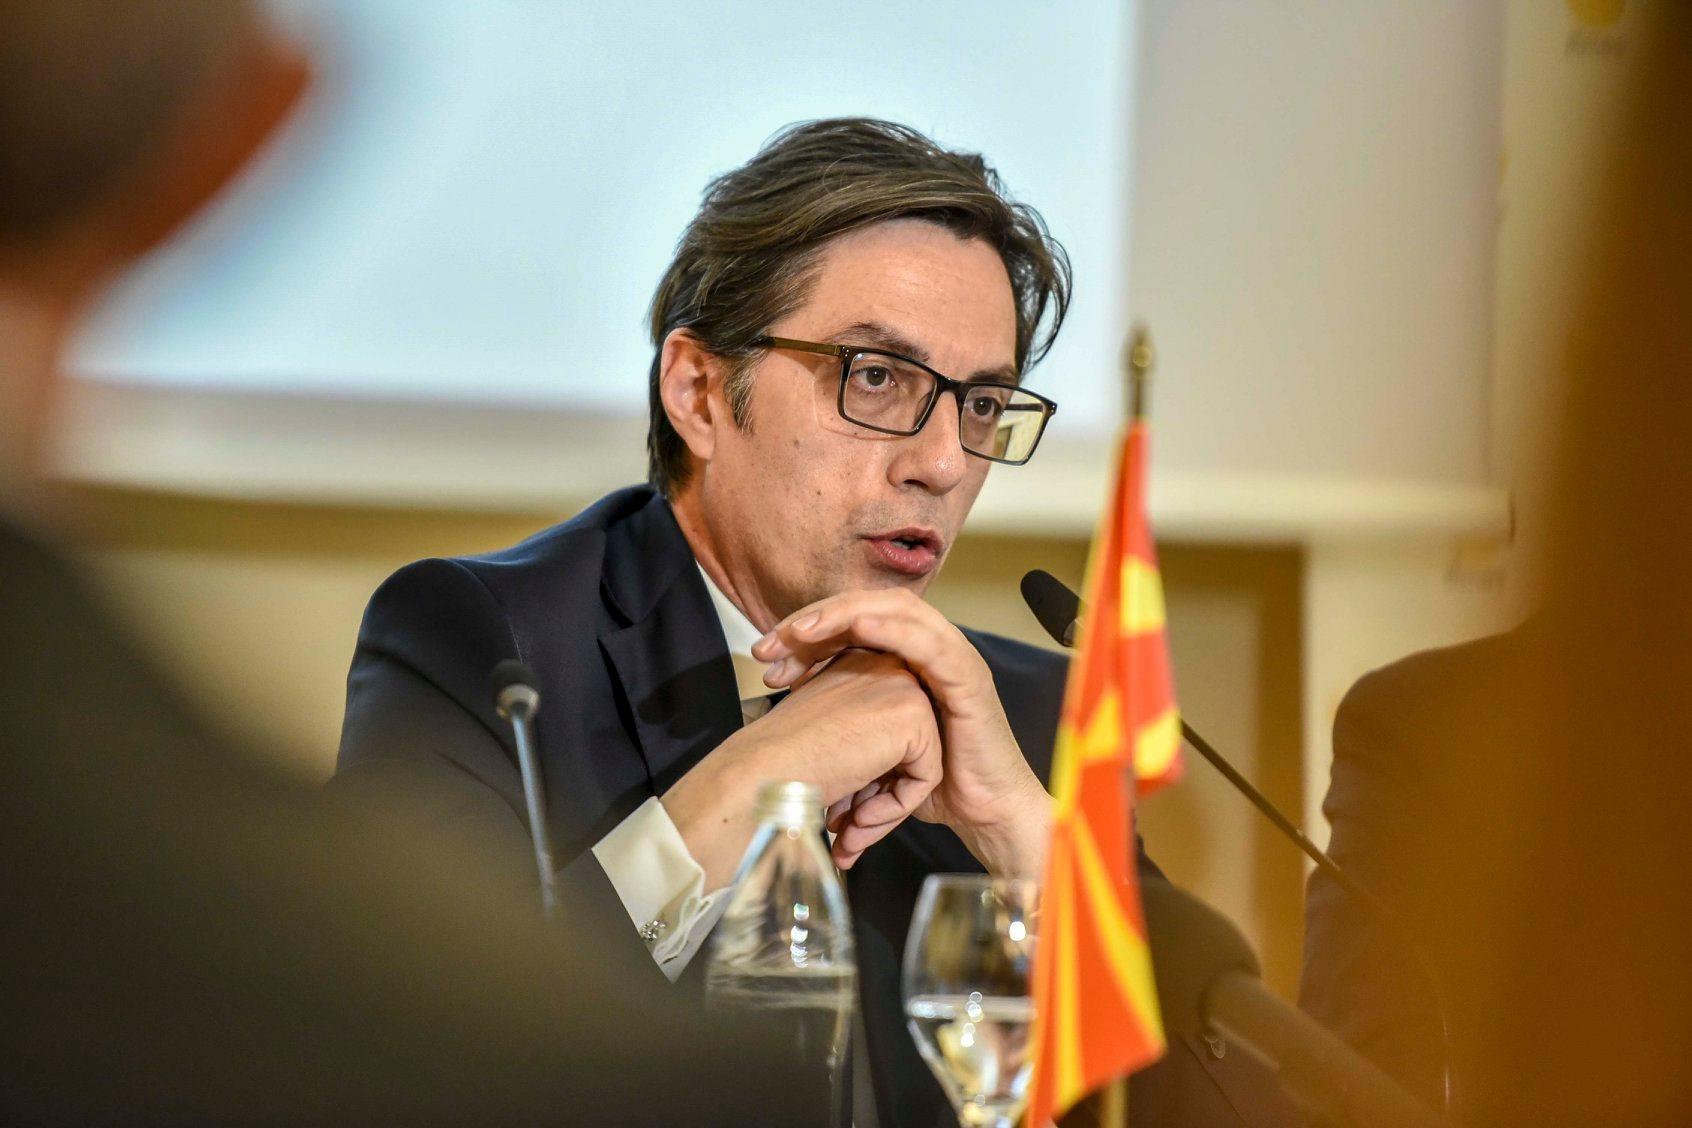 Exclusive/Pendarovski: I regret the misinterpretation of my statements